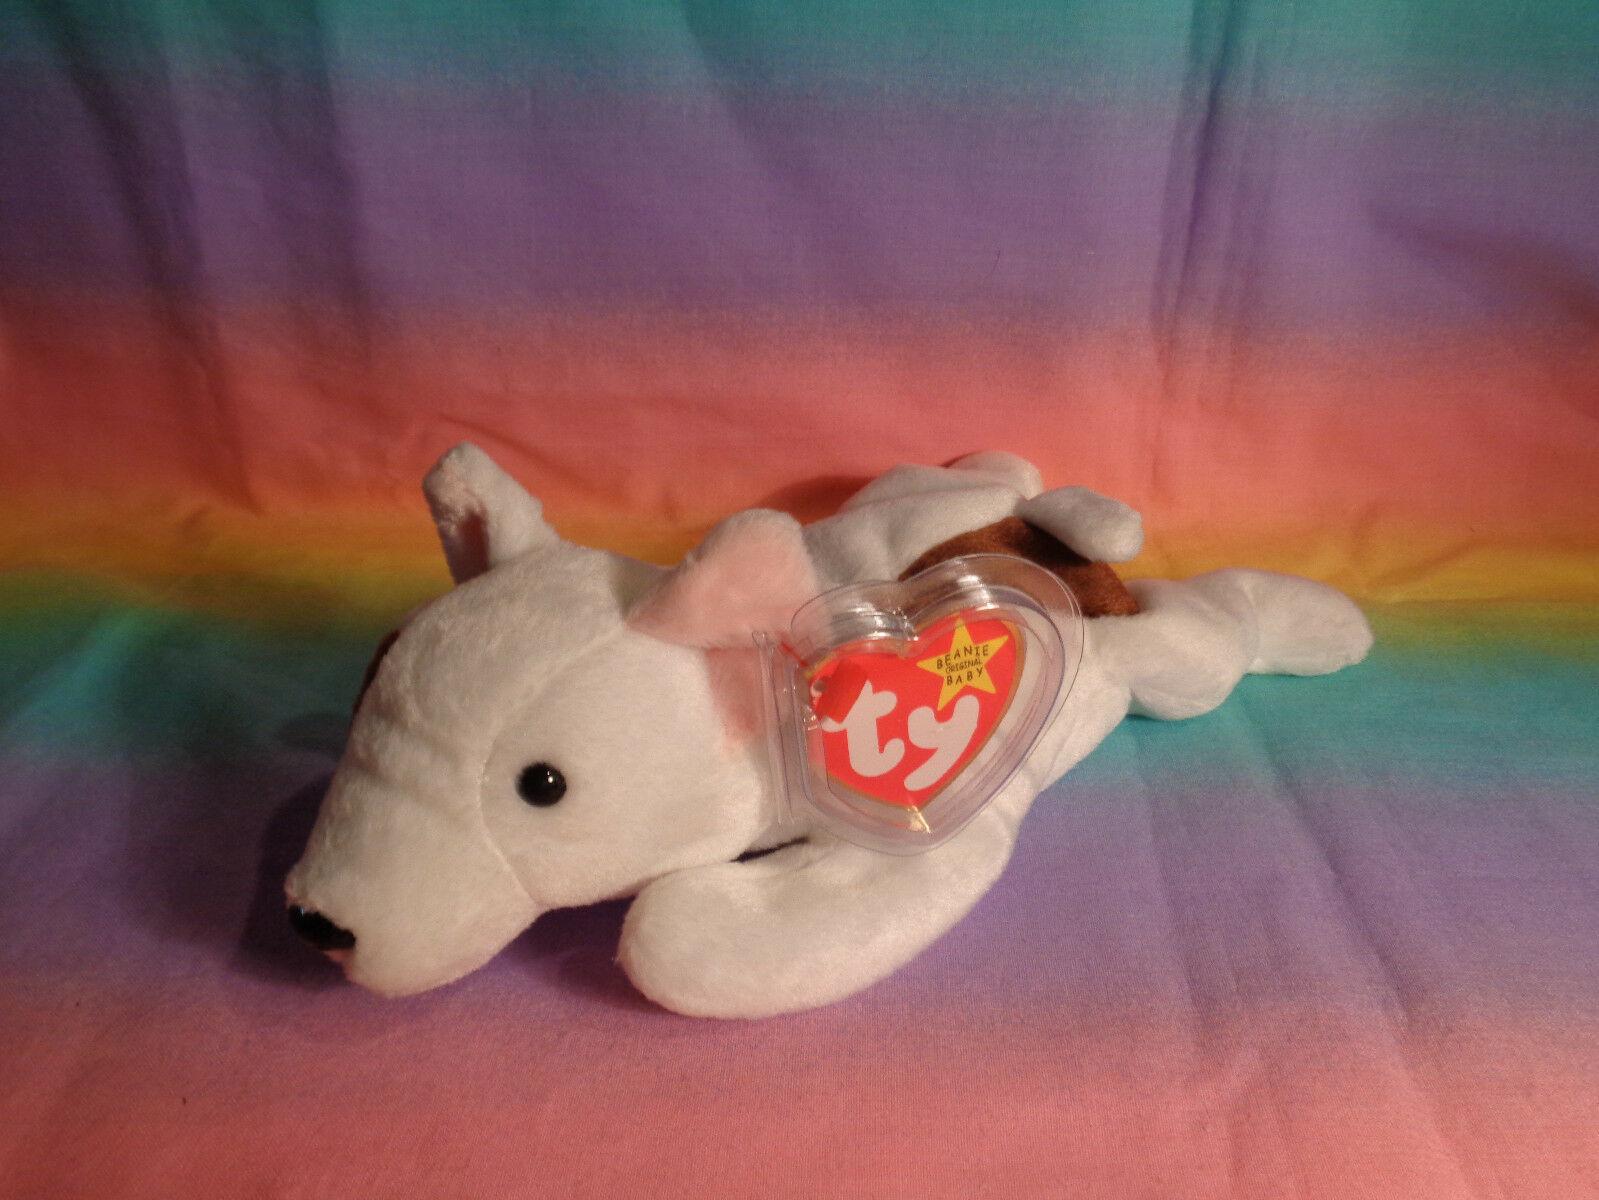 Vintage 1999 Ty Beanie Baby Butch Dog Bean Bag Plush w/ Tags